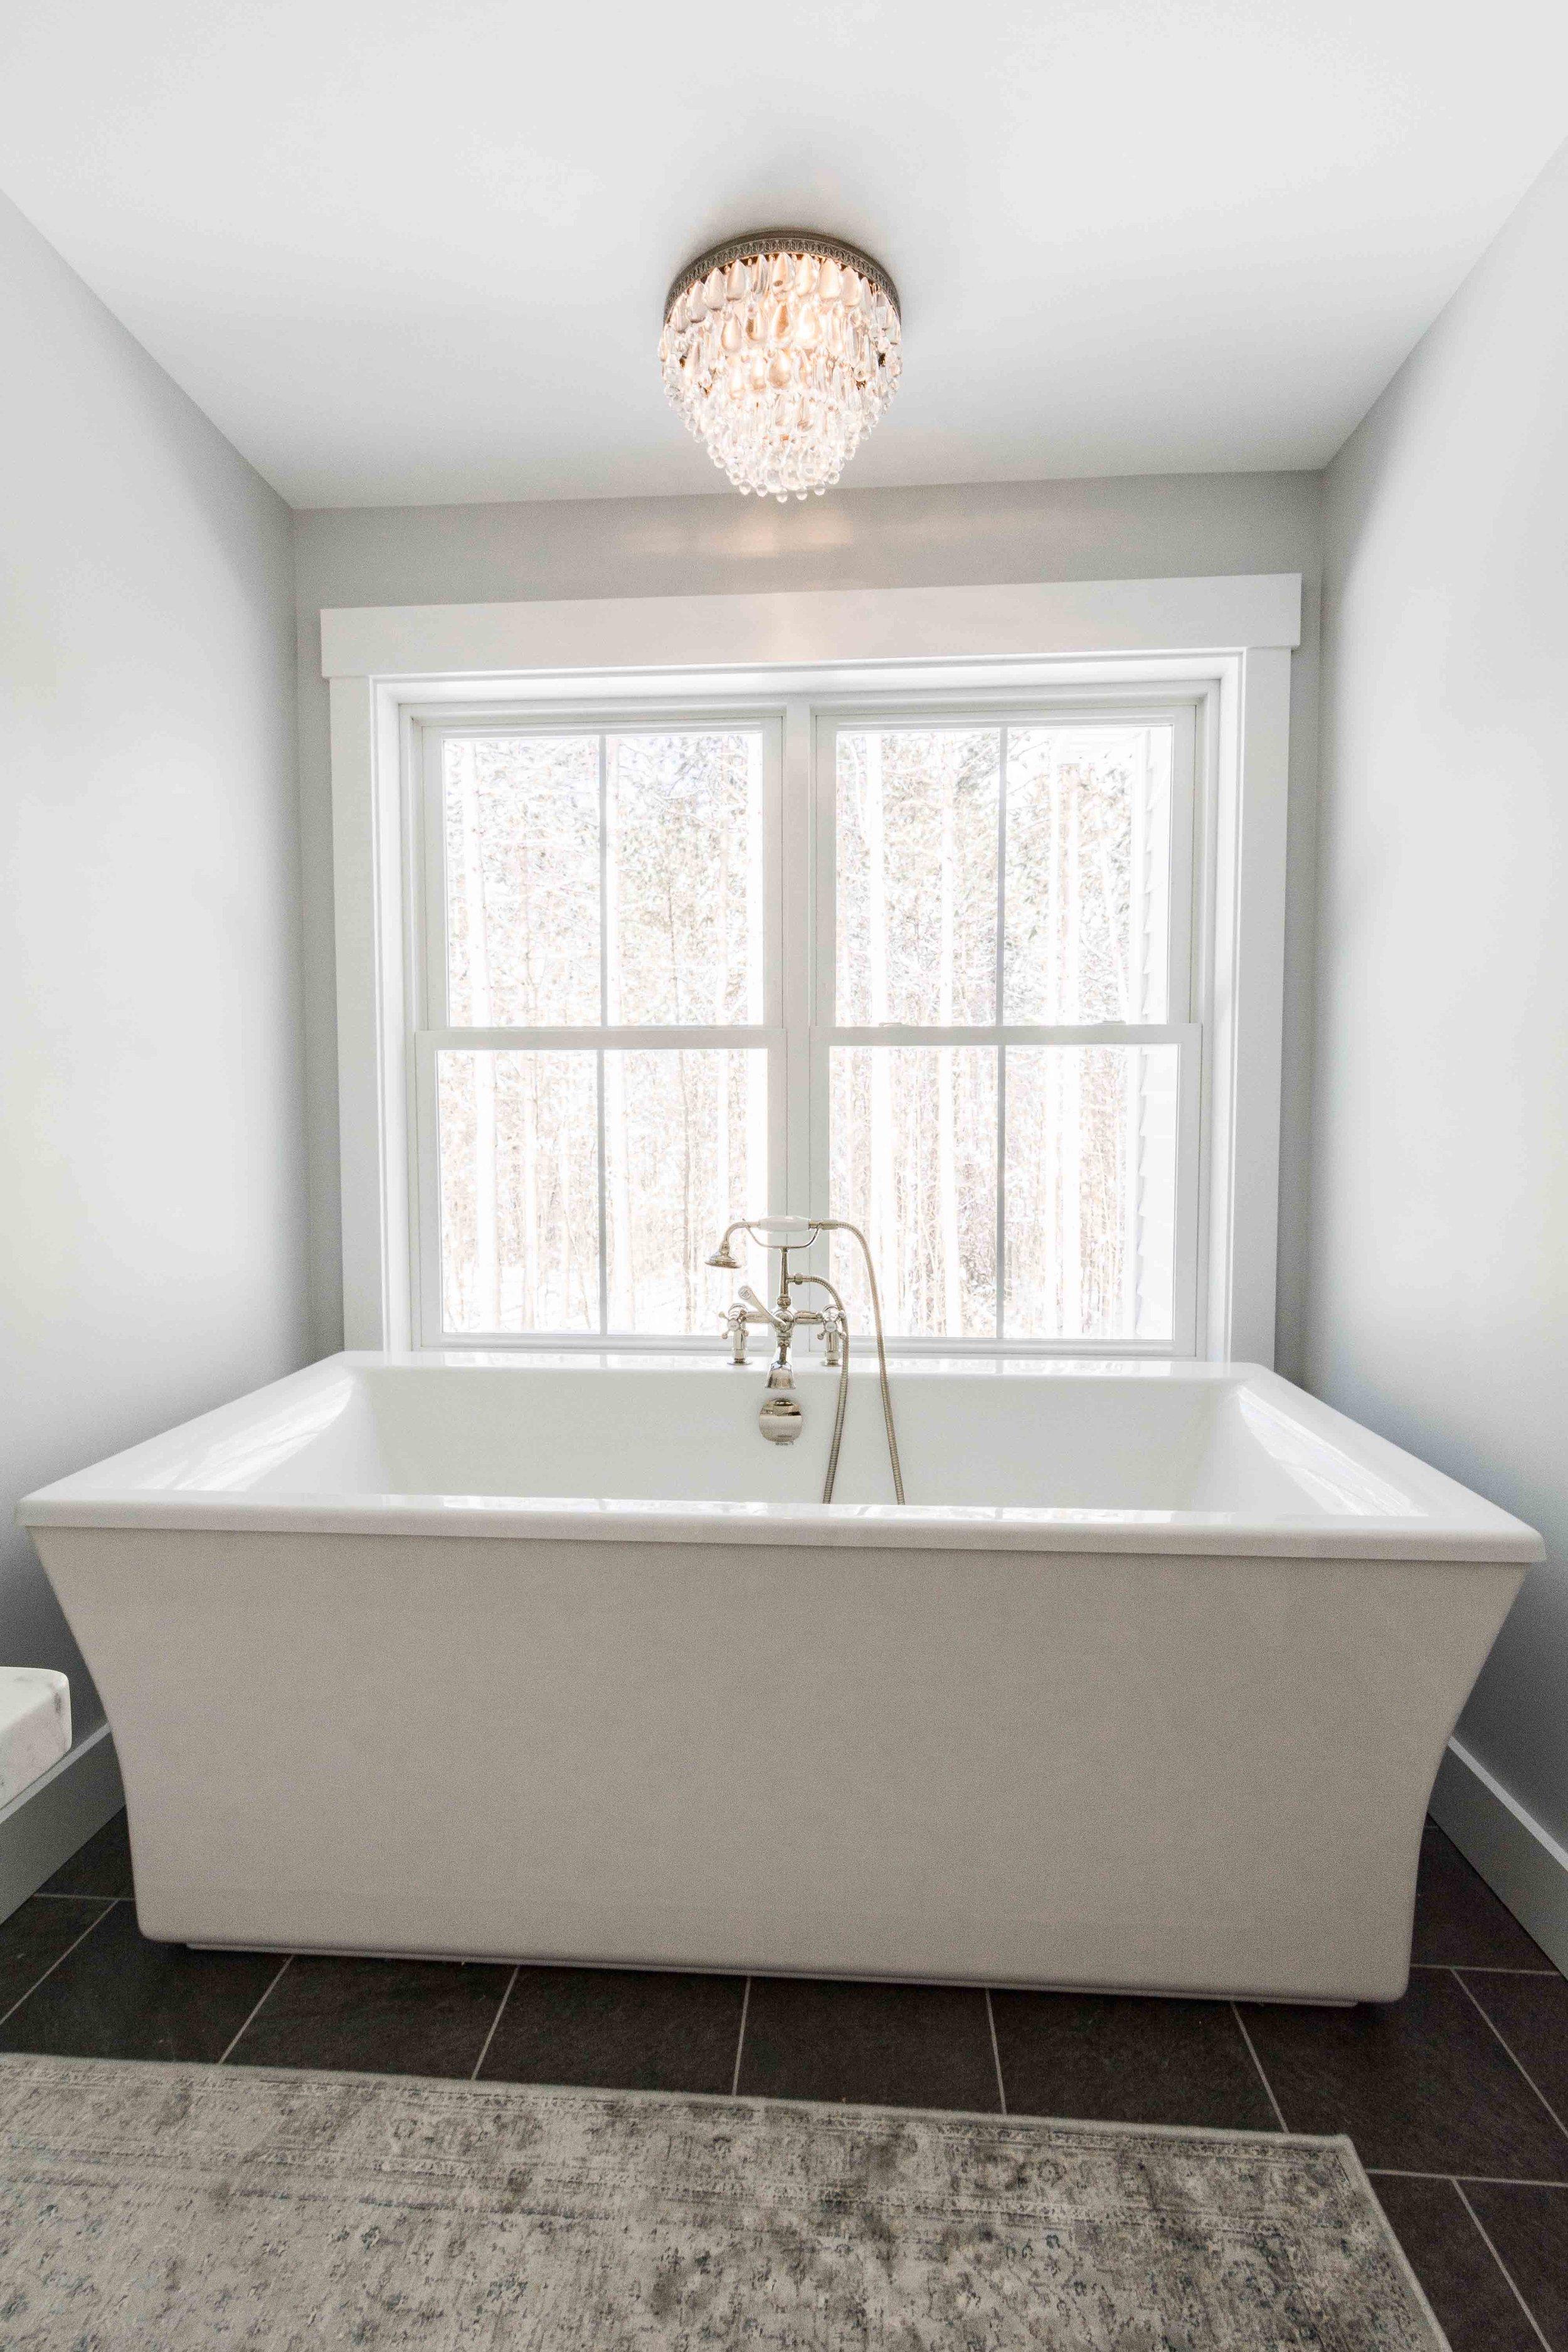 Pleasant River Farmhouse, Windham, Maine, Master Bathroom Tub